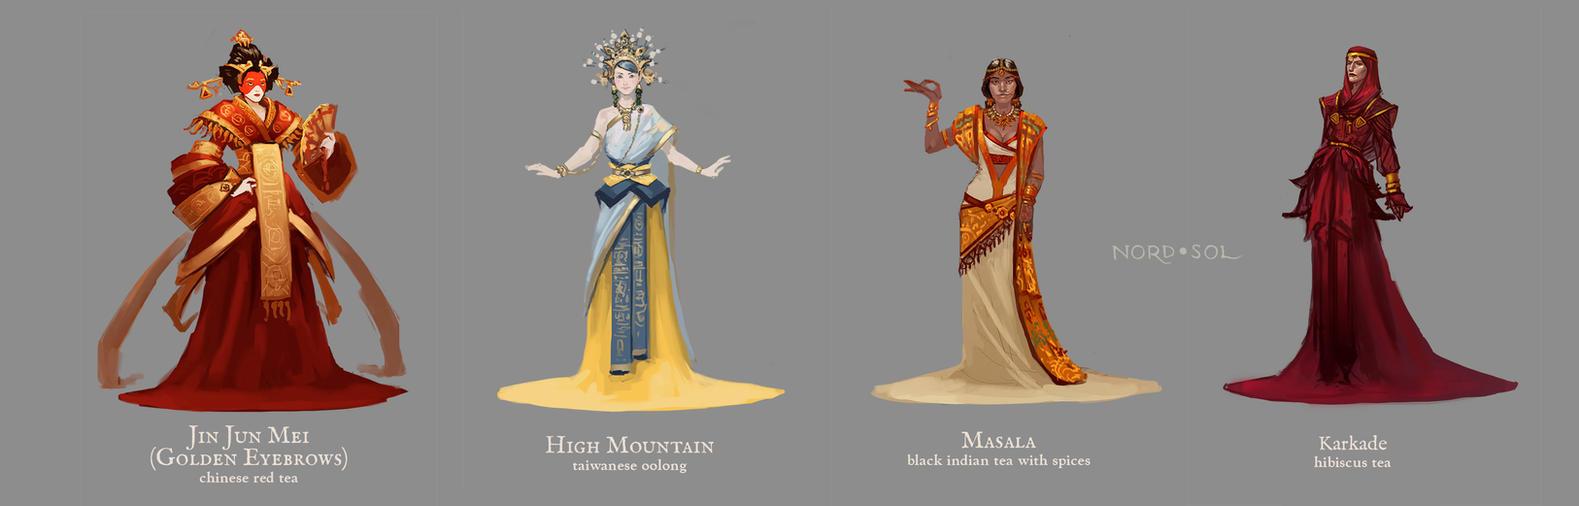 Tea Princesses Part 2 by Nord-Sol